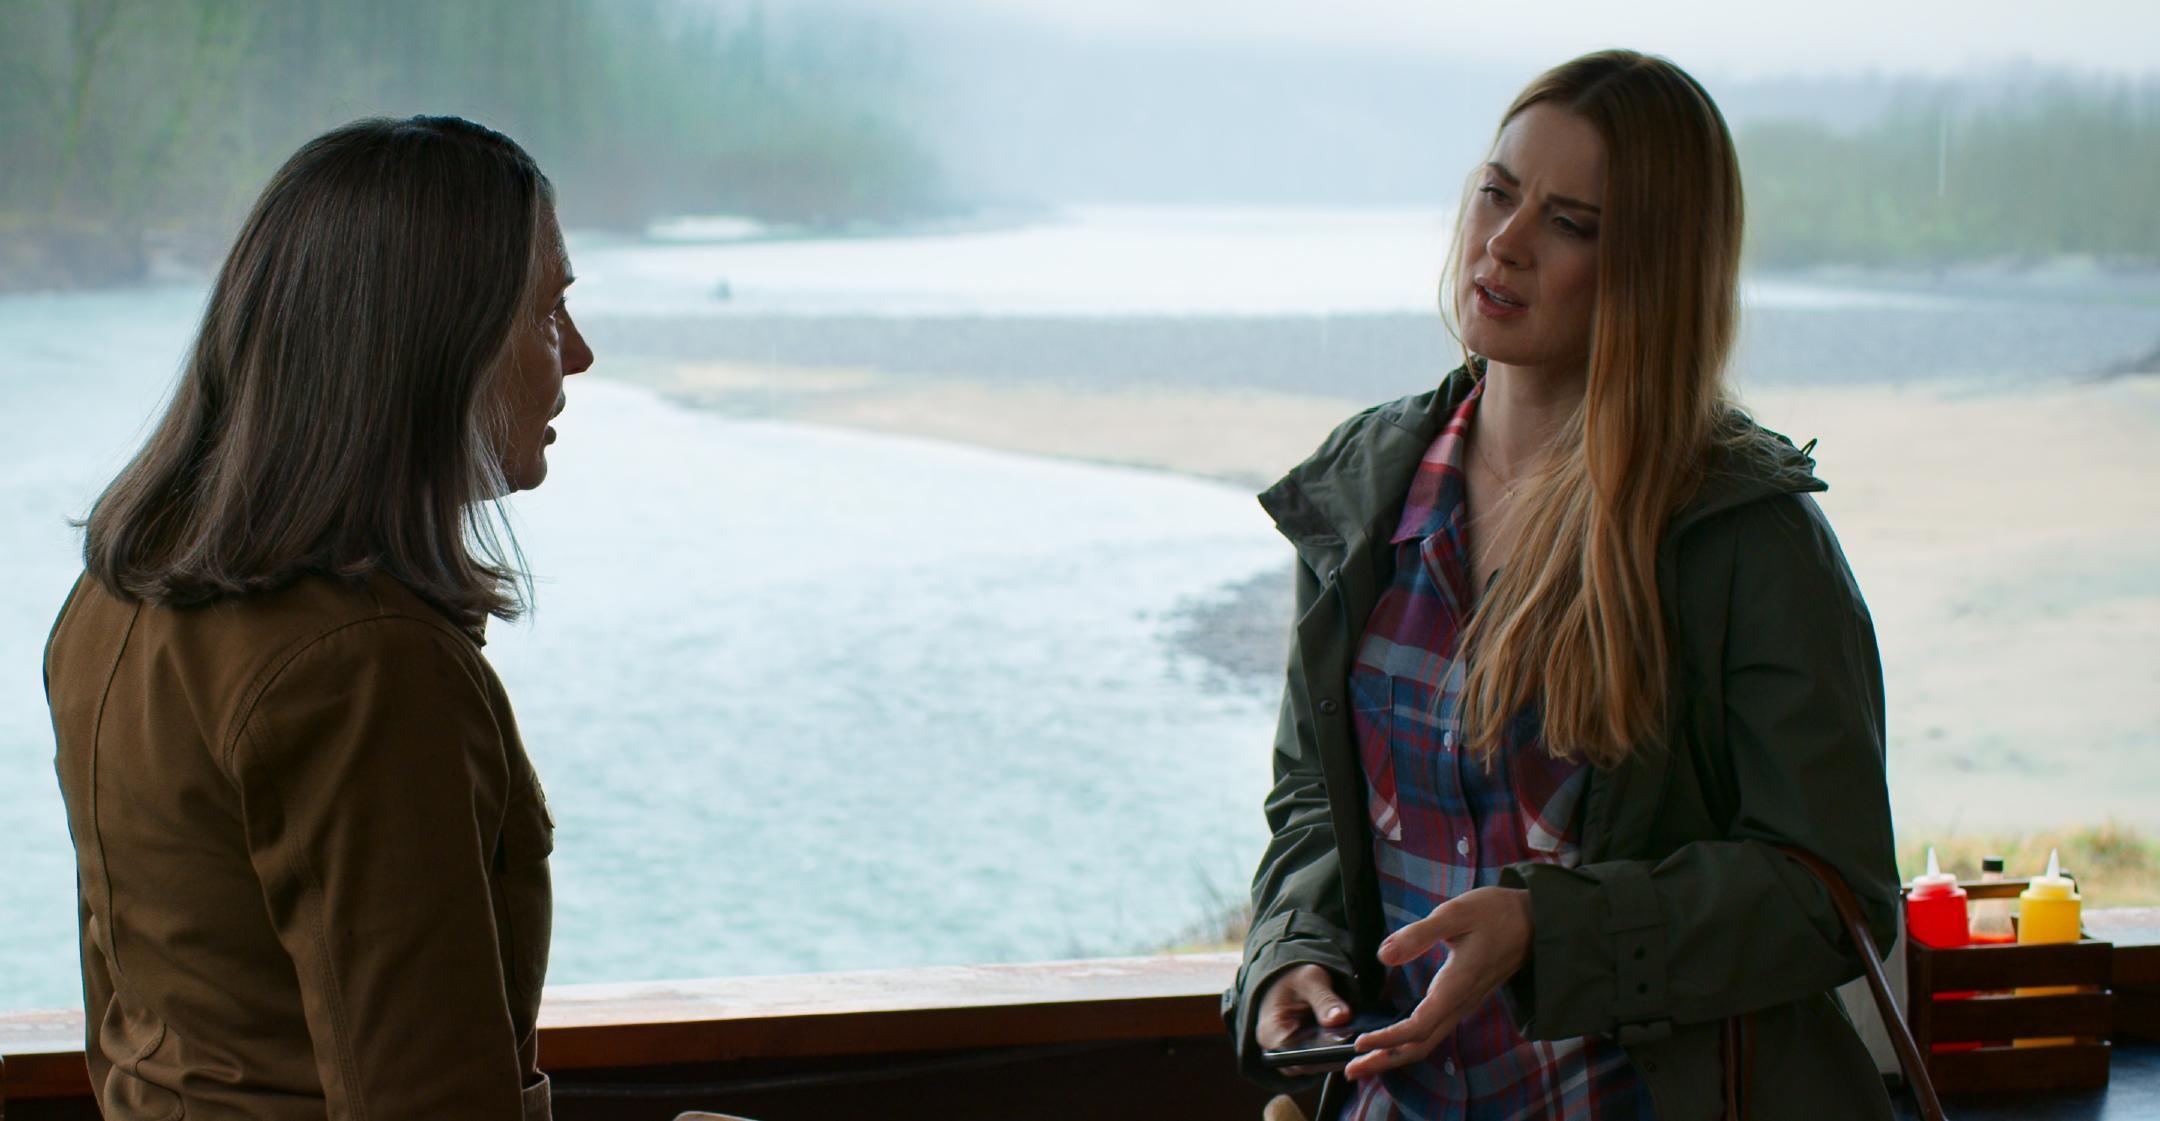 season  of netflixs romantic drama virgin river premiere this summer mh